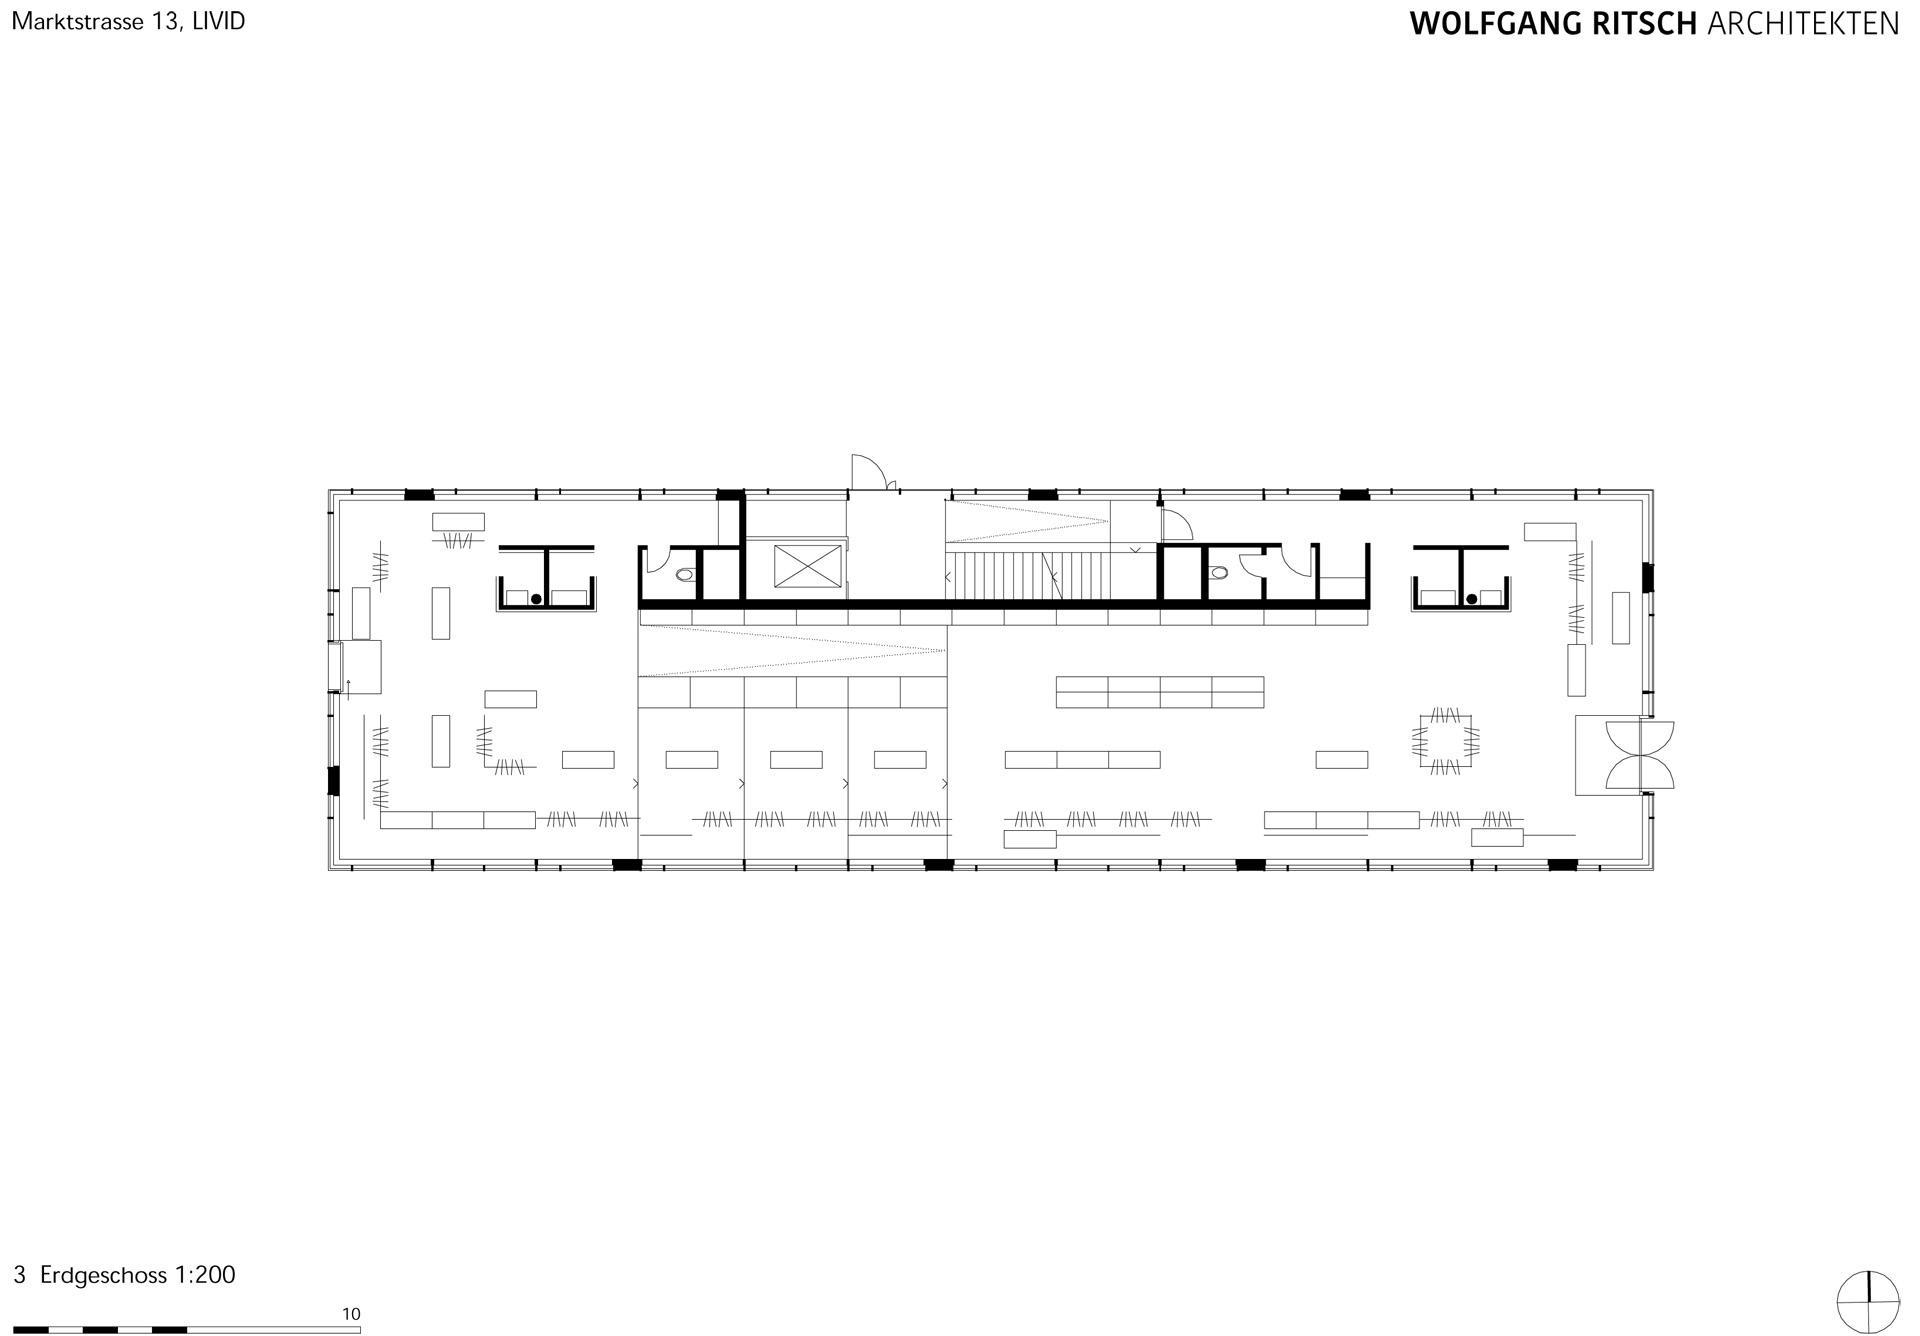 X:PROJEKTE70003410 MS132-PUBLIPLAN20-dwg903_EG.dwg 200_pri